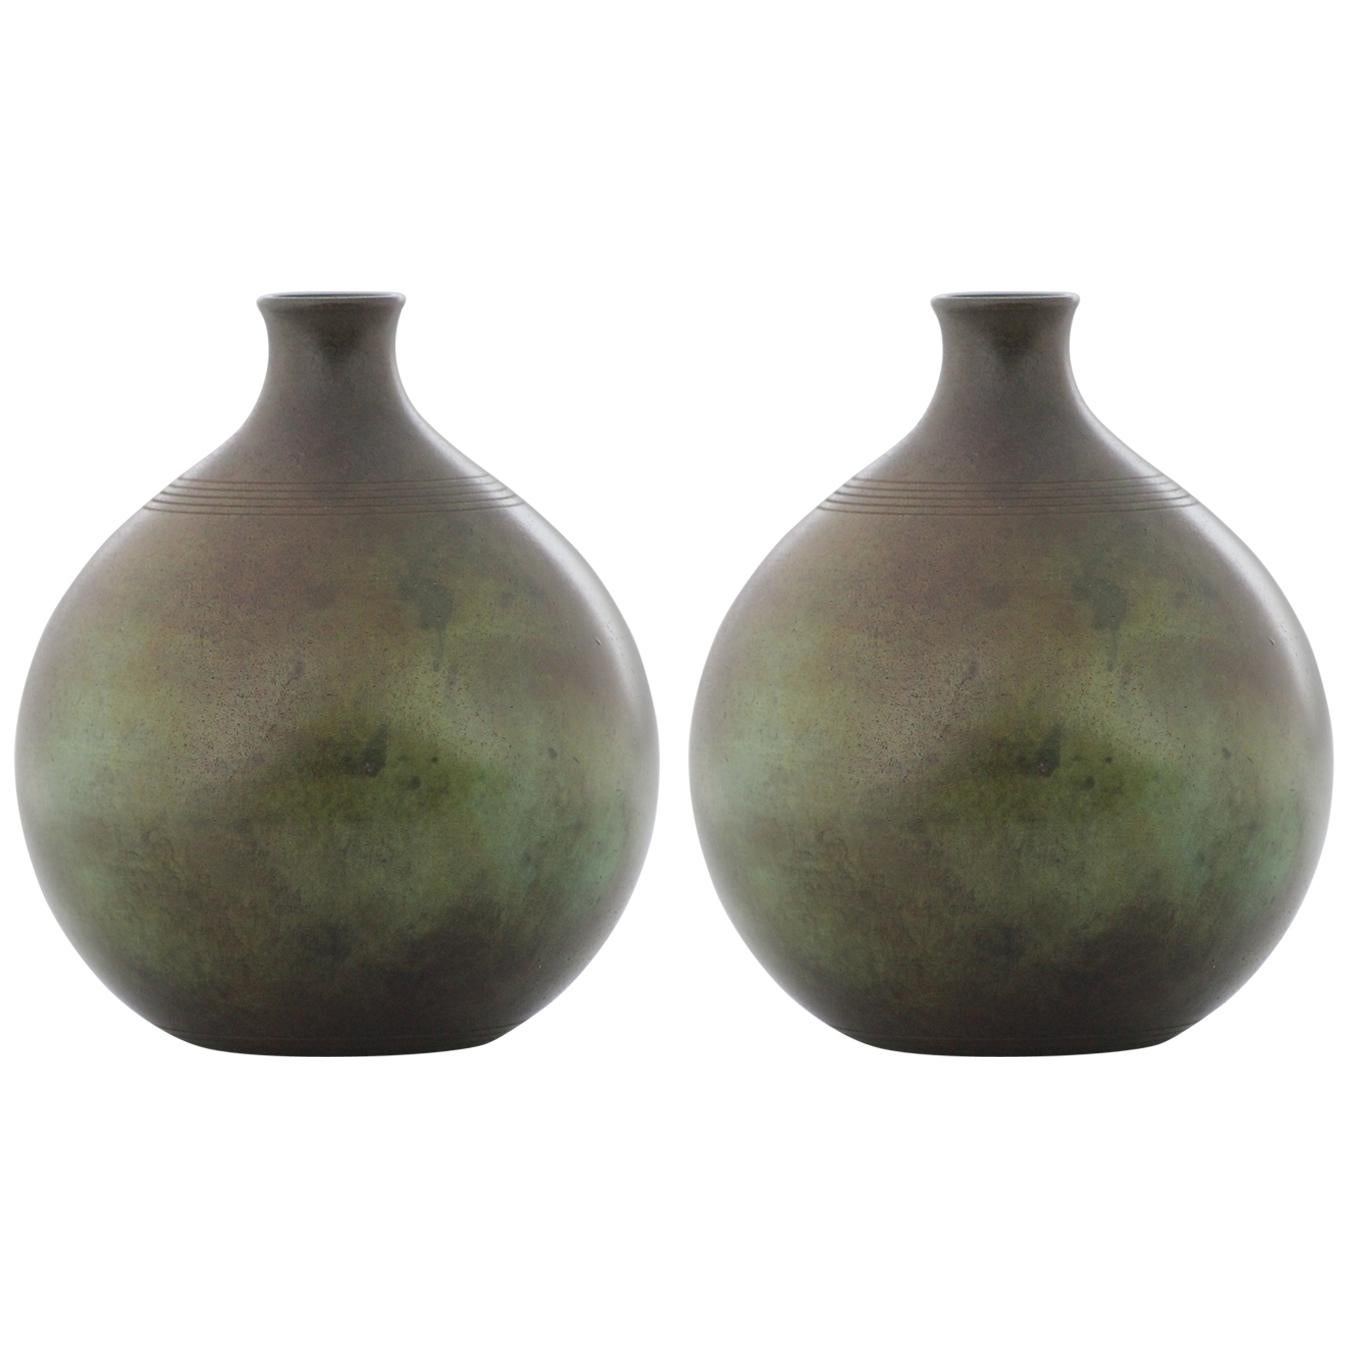 Pair of Swedish Modern GAB Patinated Bronze Vases, Stockholm, 1930s